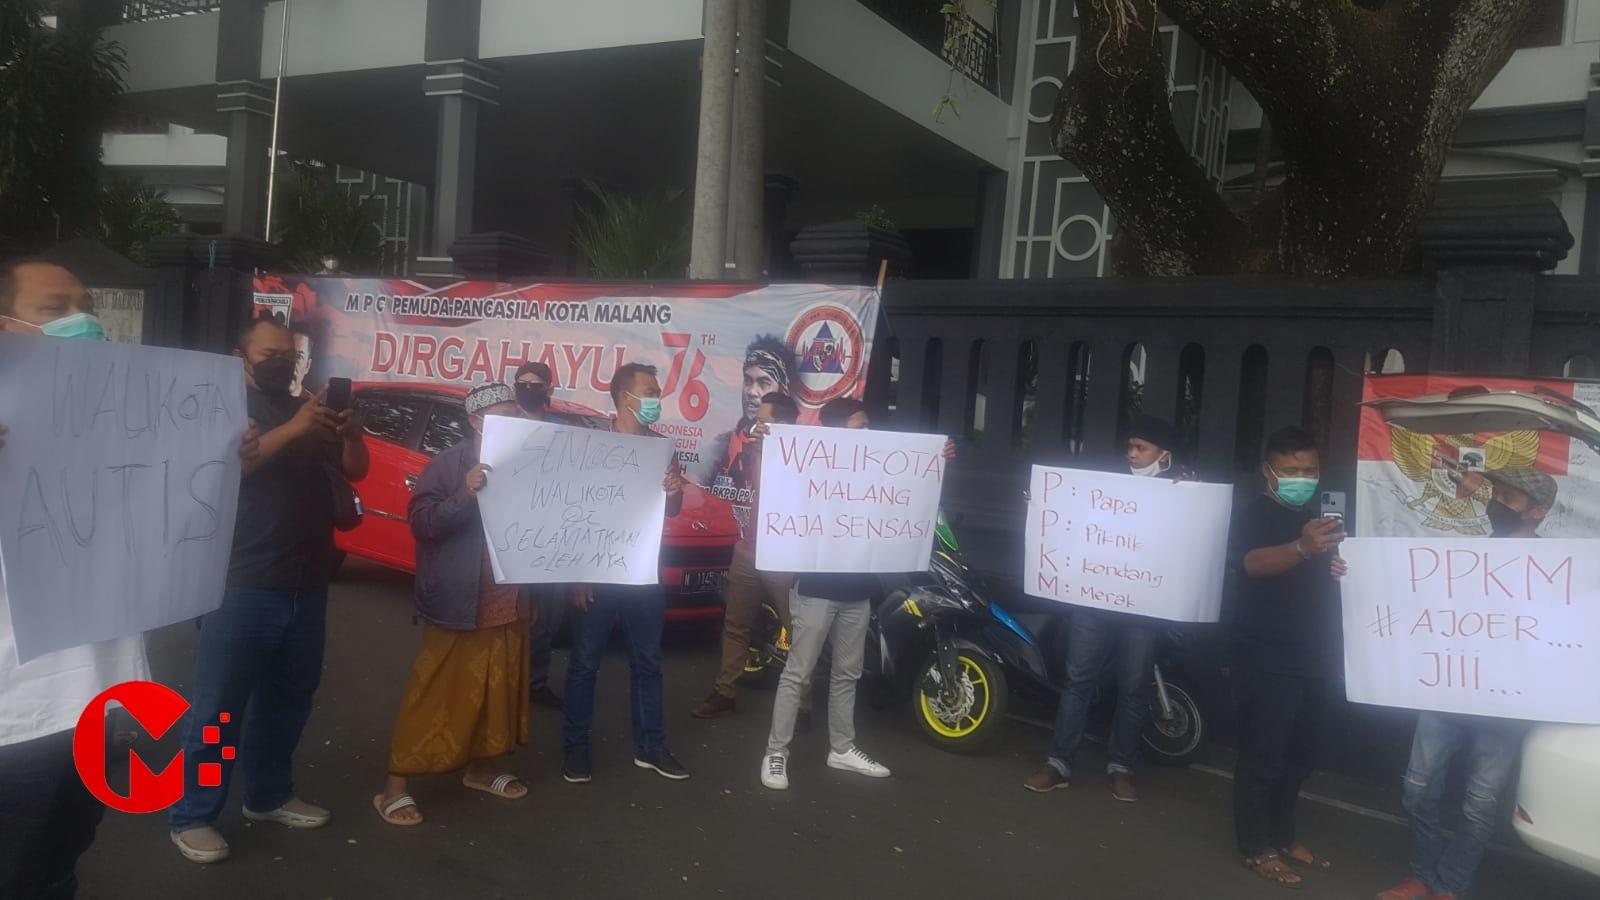 Foto : Aktivis Jaasmara saat gelar aksi didepan balai kota malang